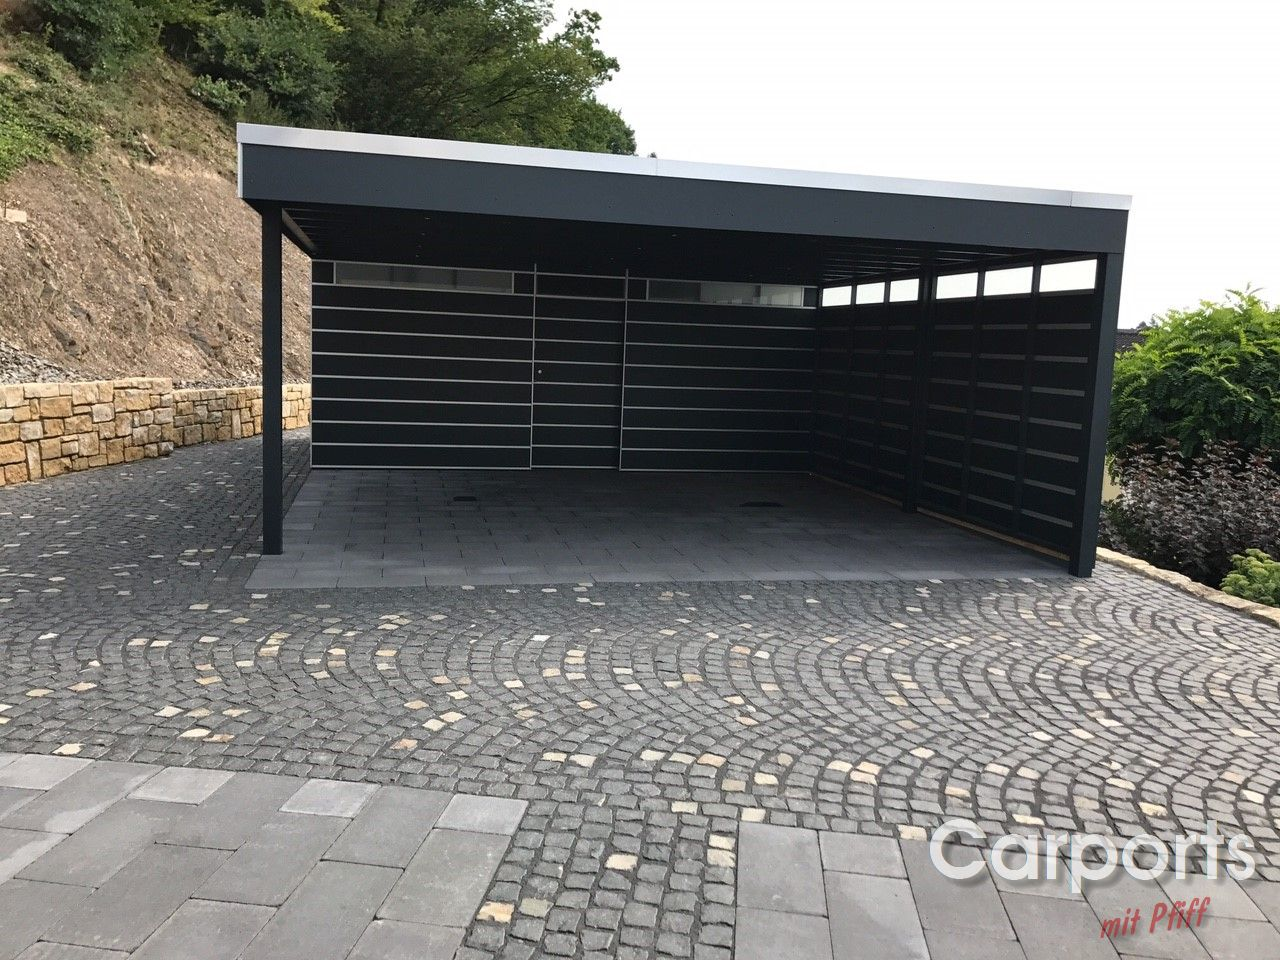 Carport bauhaus hpl mit abstellraum und verkleideter for Bauhaus carport